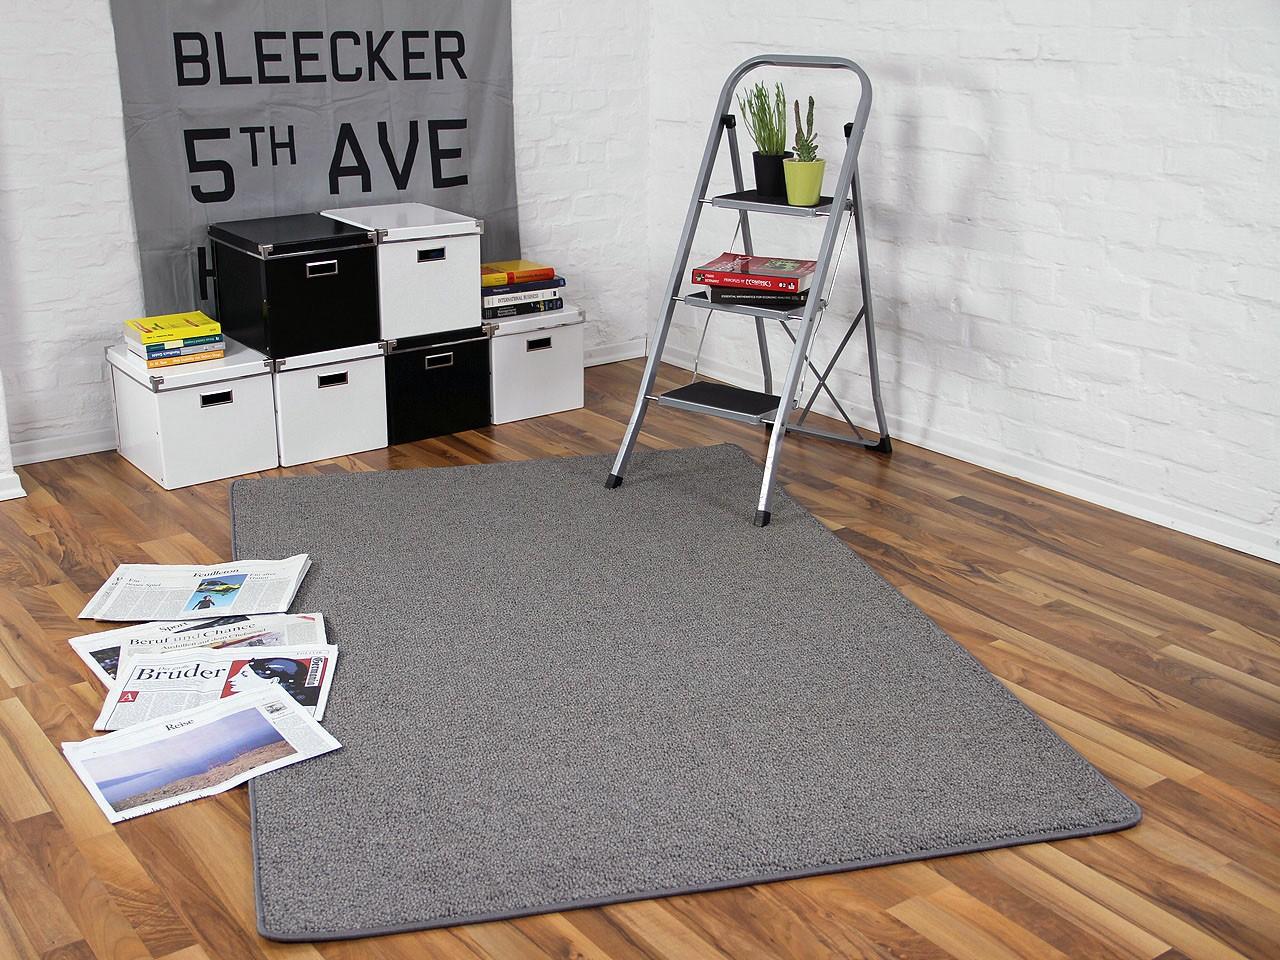 natur teppich luxus berber venice grau abverkauf. Black Bedroom Furniture Sets. Home Design Ideas